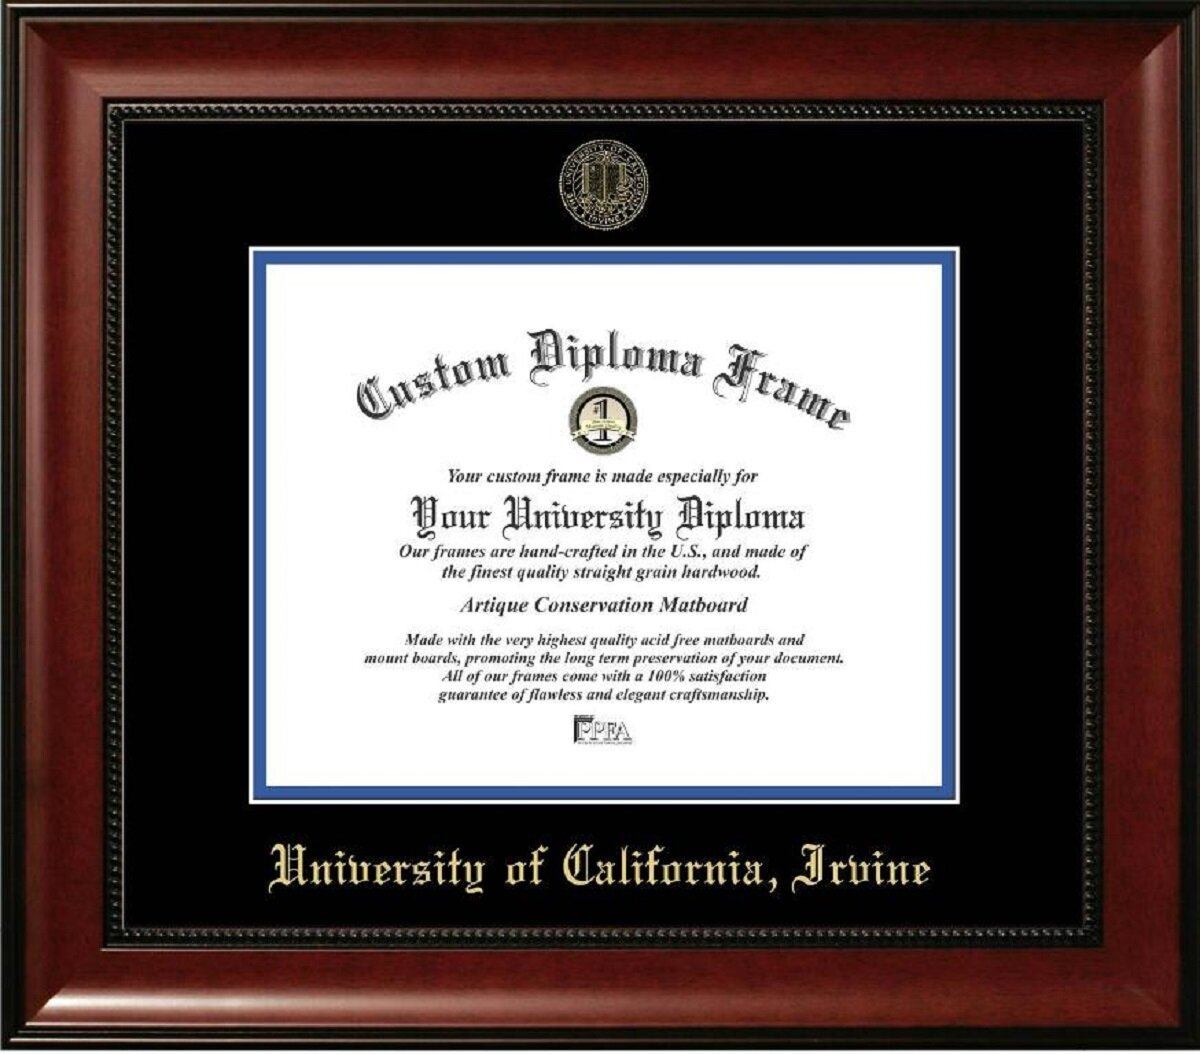 Diploma Frame Deals University of California Irvine Avalon Diploma Picture Frame